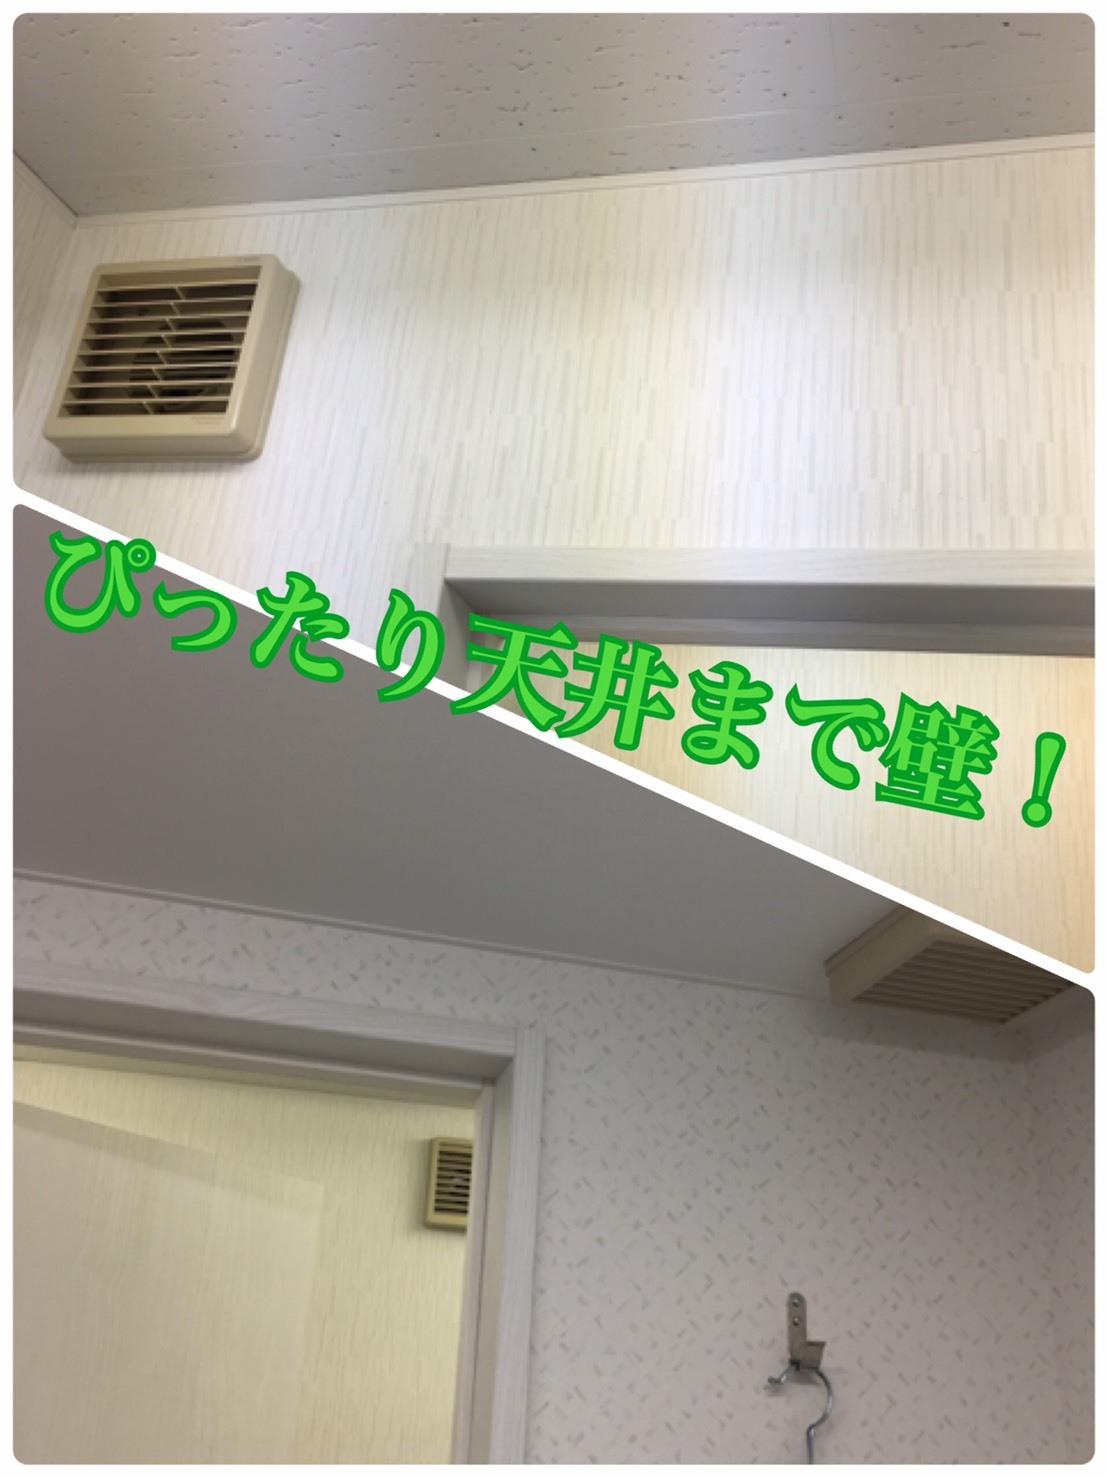 S__34979842.jpg